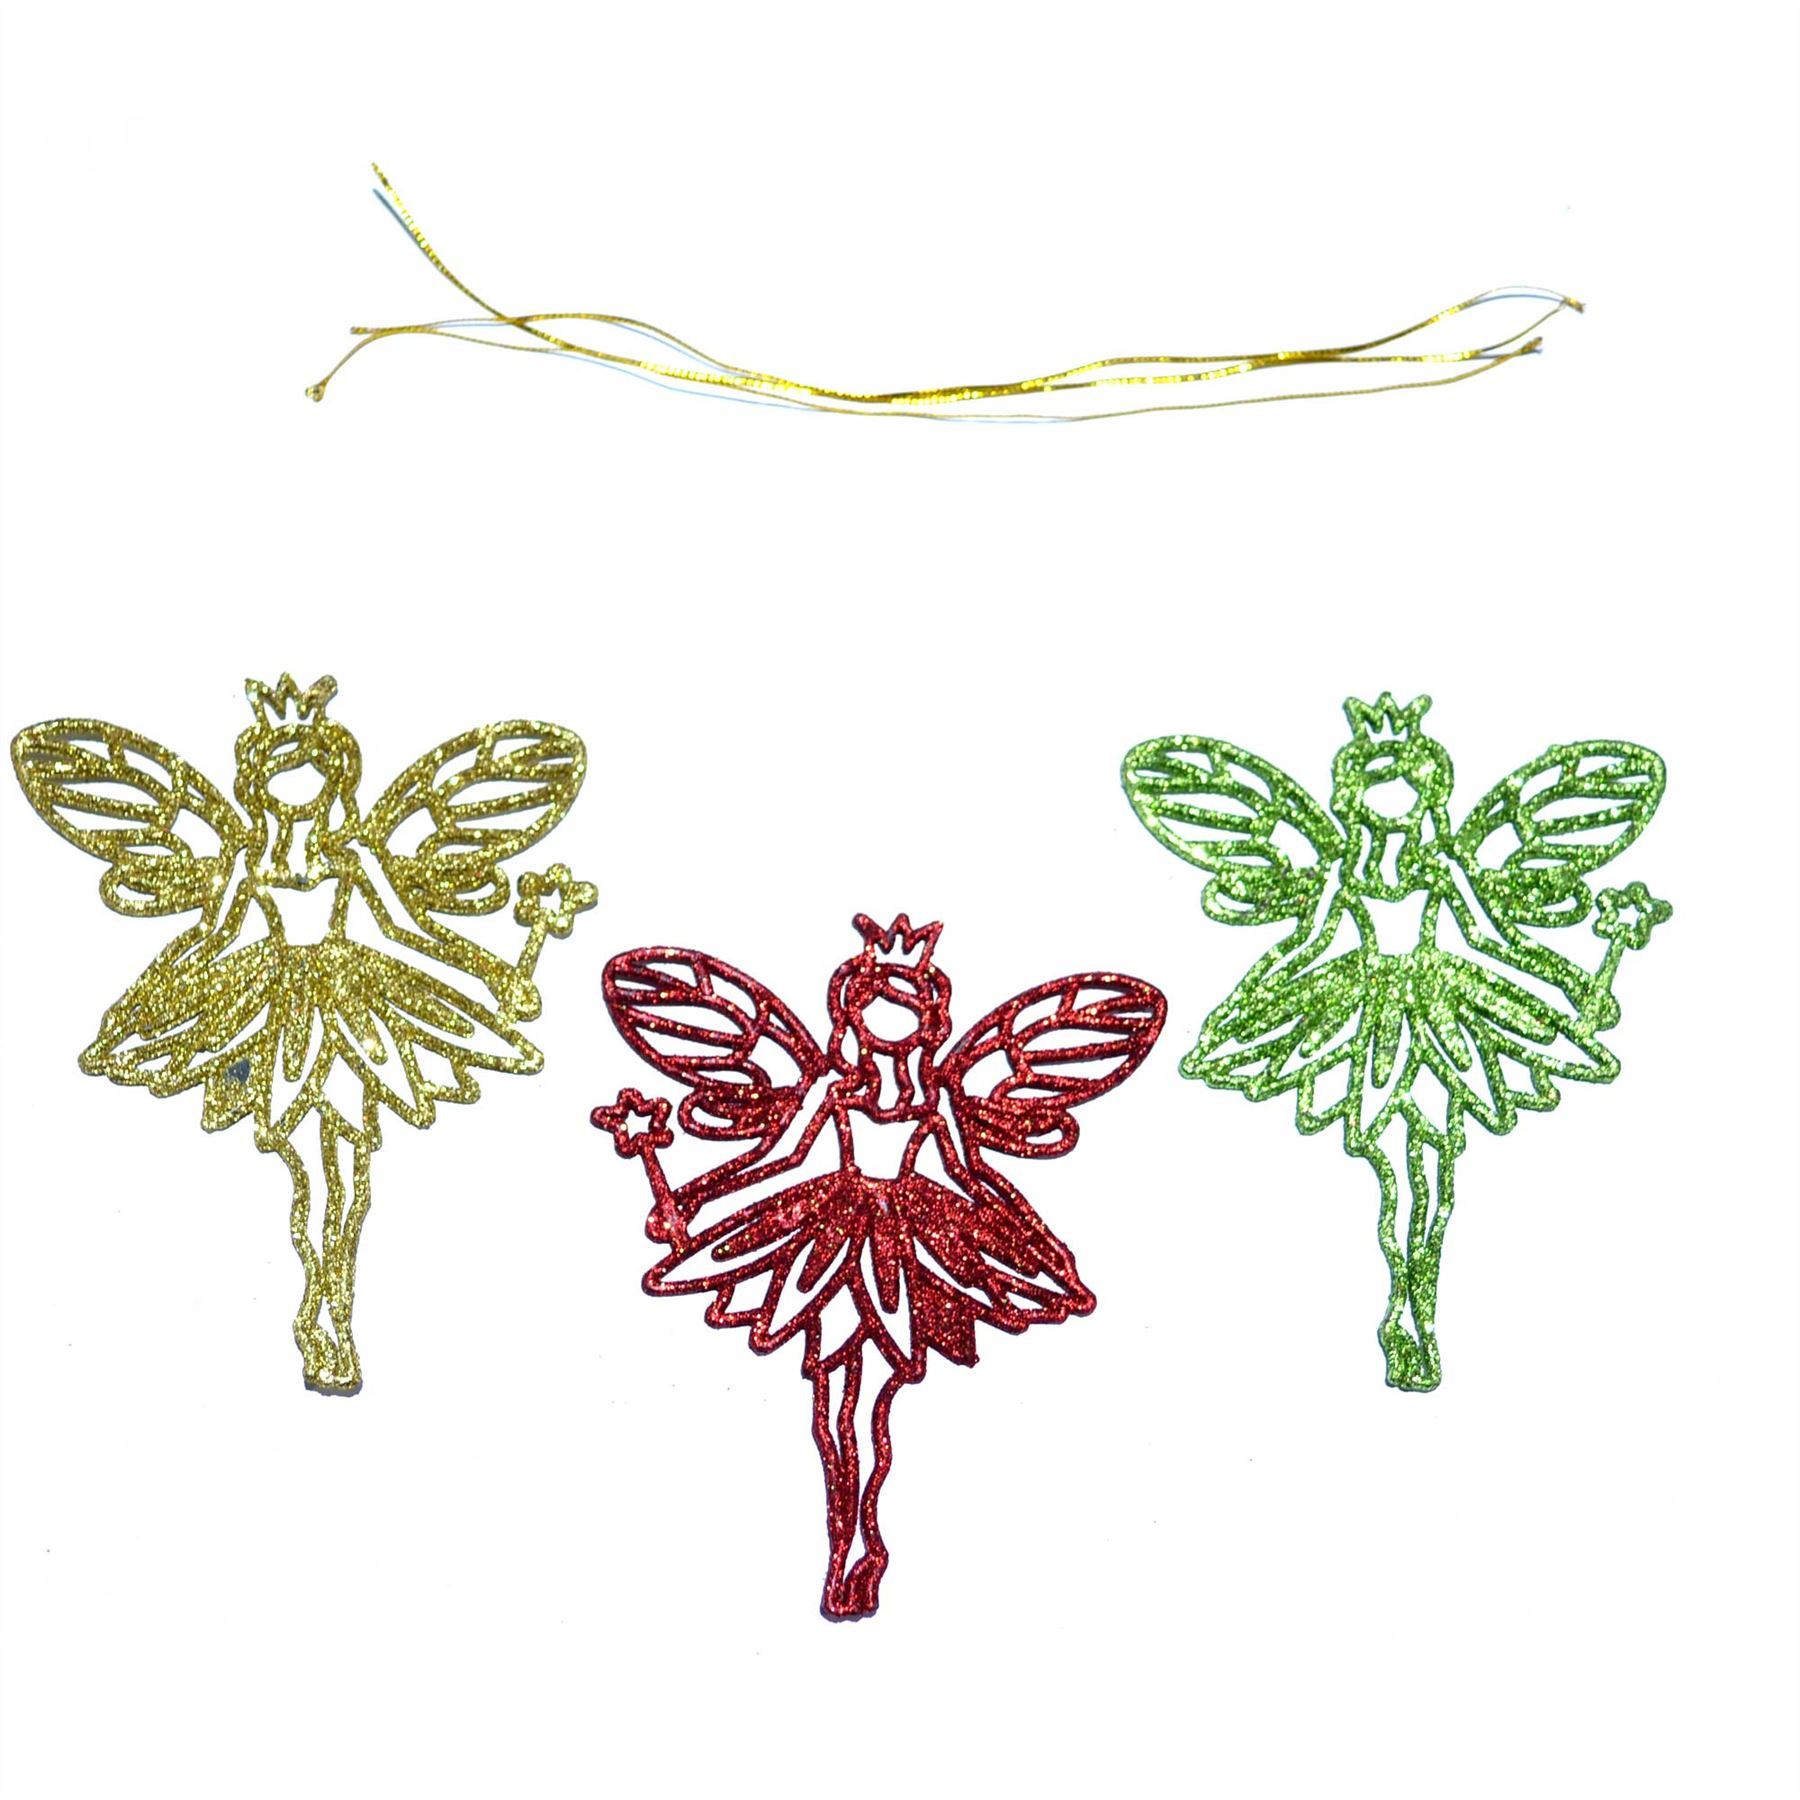 Christmas-Tree-Hanging-Decorations-Glitter-Snowman-Xmas-Beads-Chain-Garland thumbnail 3